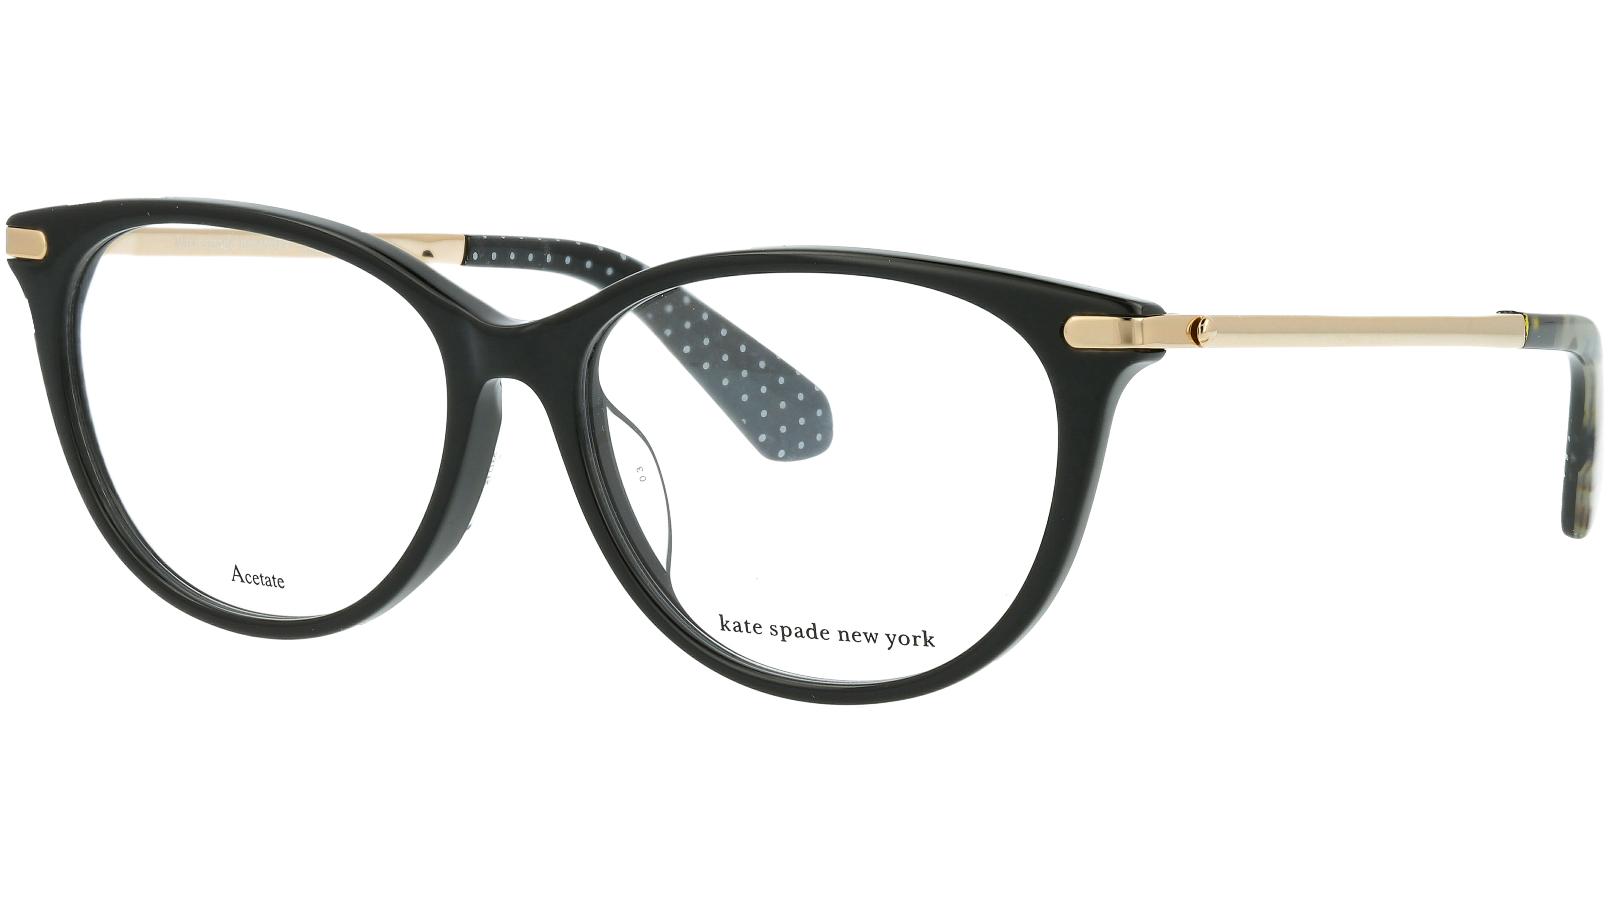 KATE SPADE ALBIE/F 807 53 BLACK Glasses